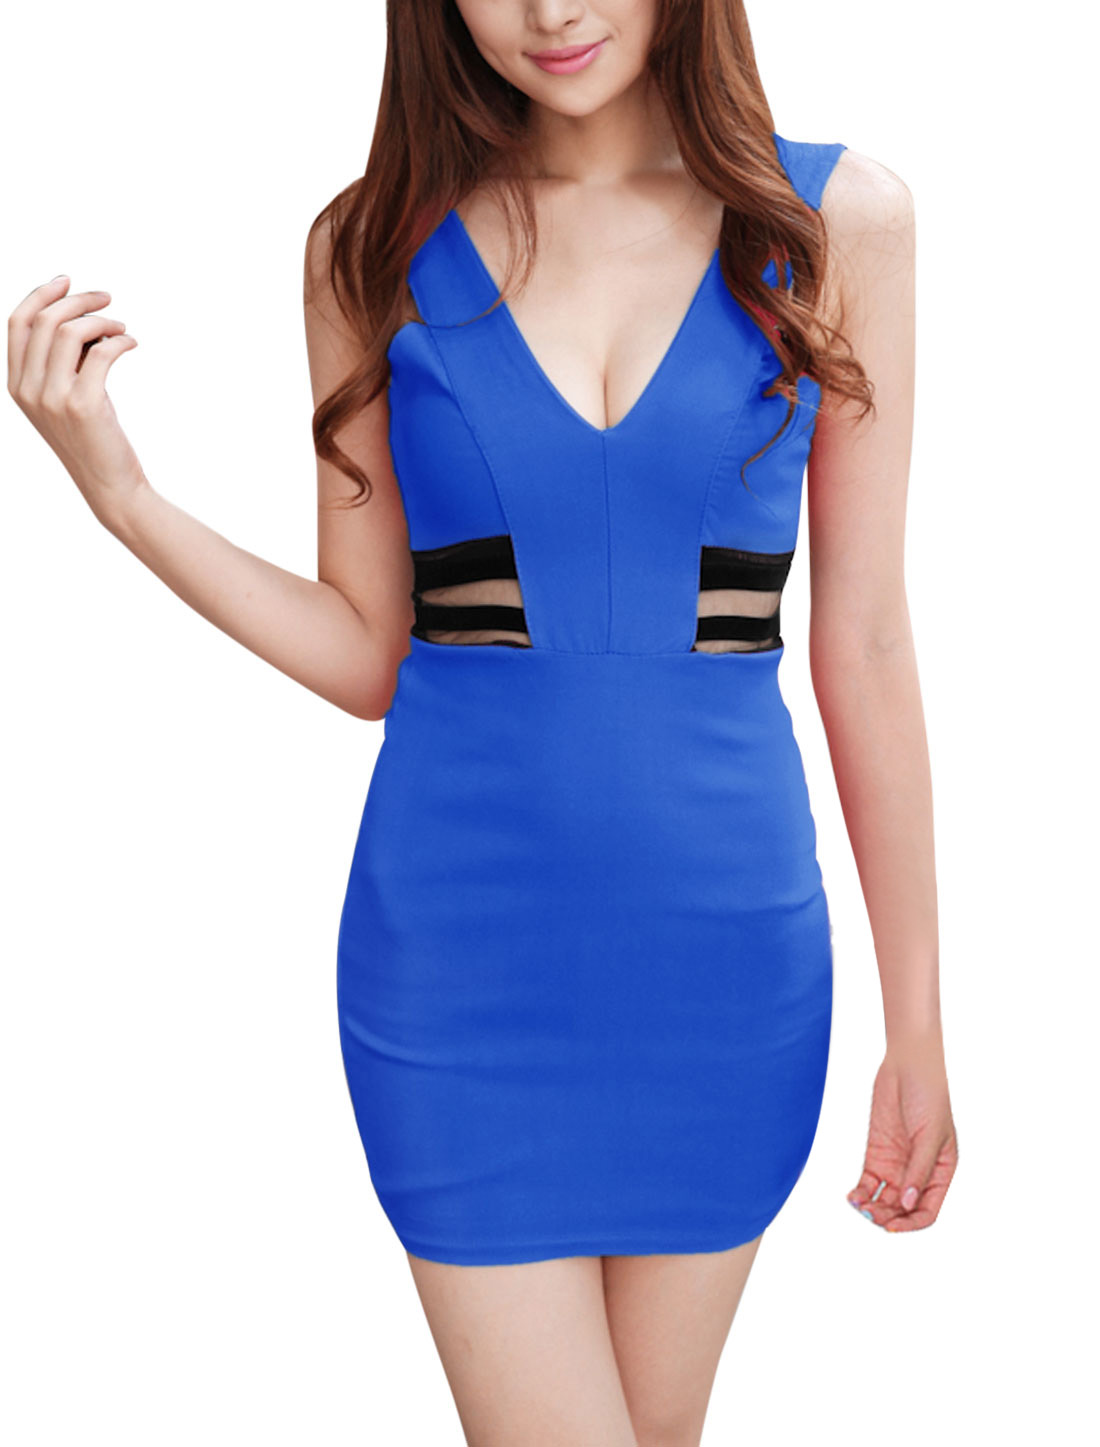 Ladies Club Wear Shoulder Straps Royal Blue Sheath Blue XS